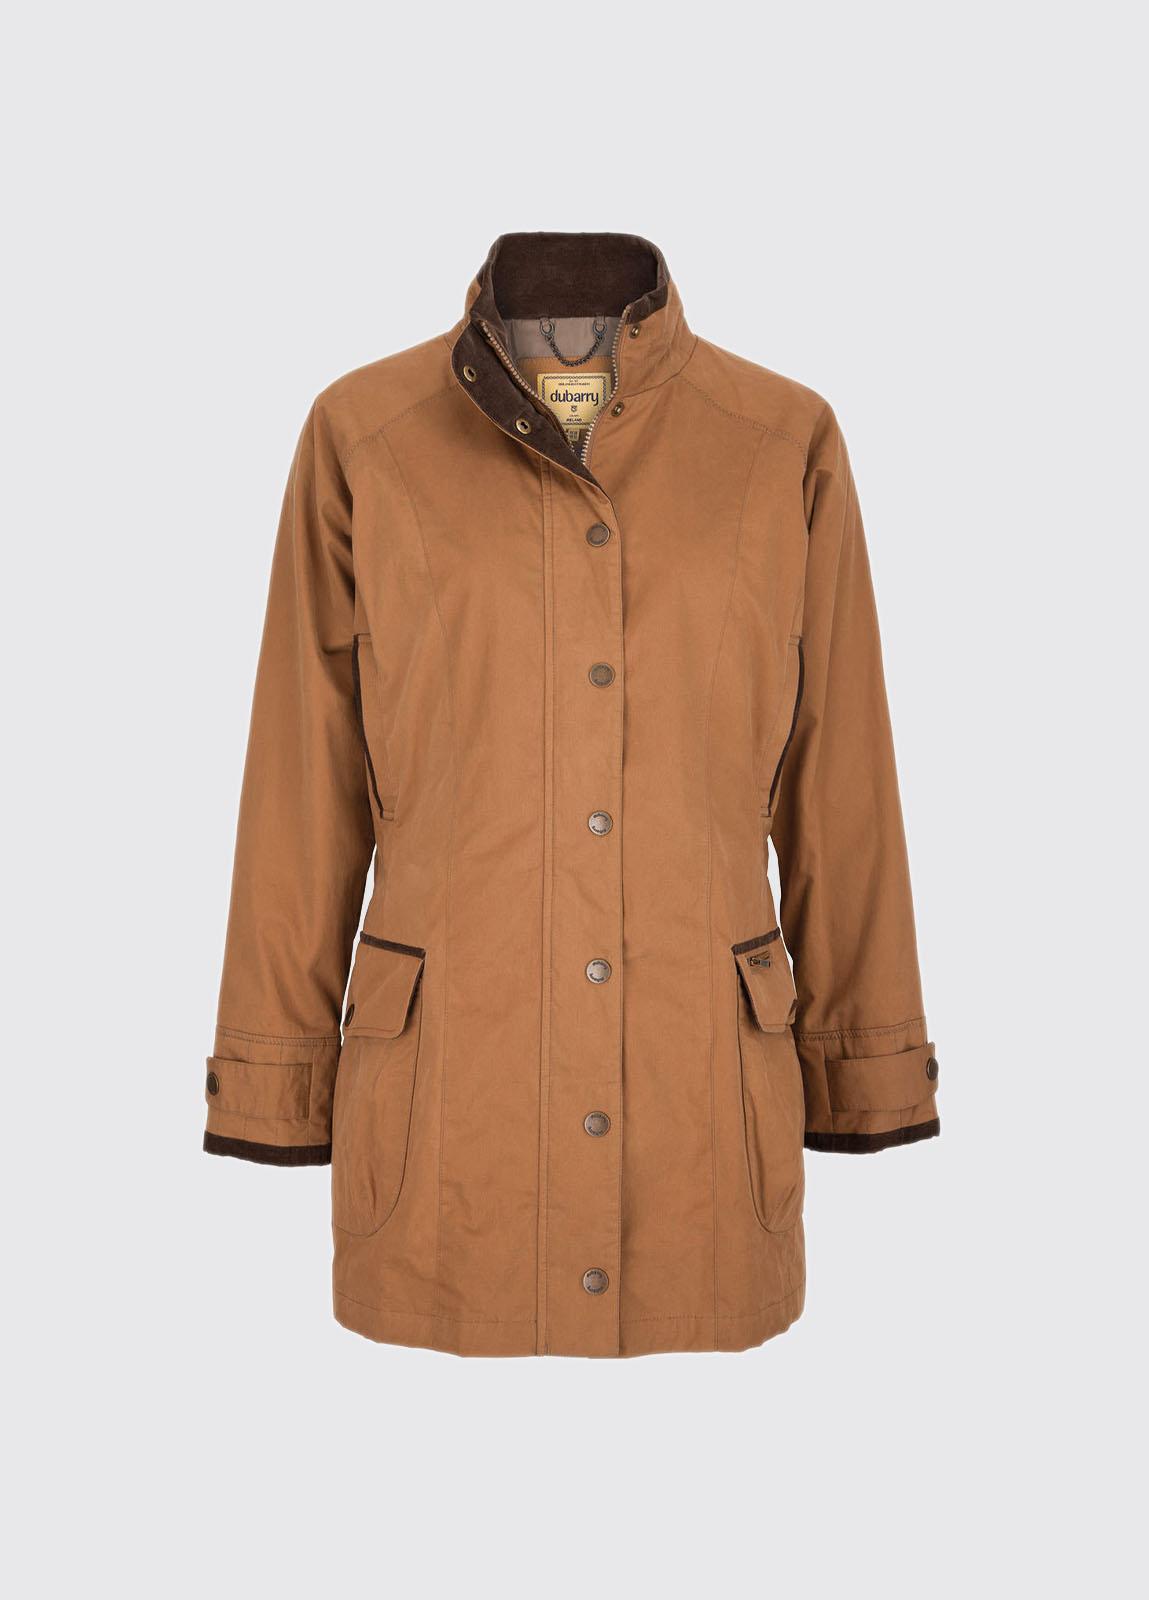 Lavery Waterproof Jacket - Old Gold